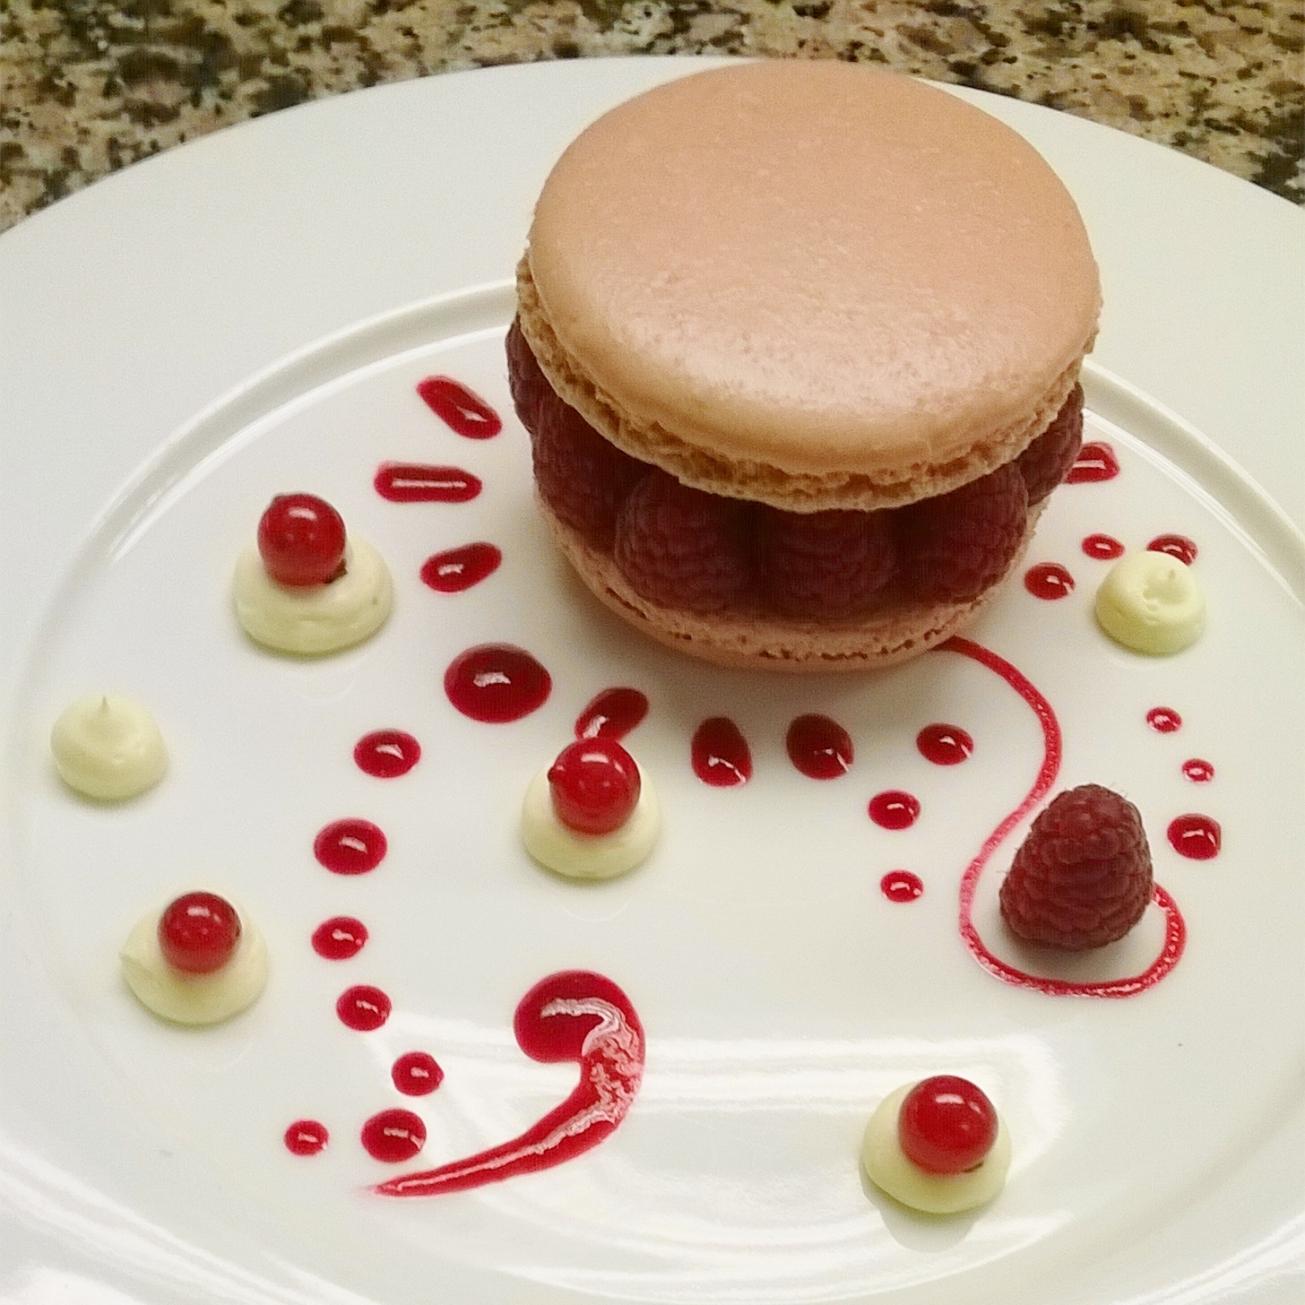 Raspberry anis macaron plating